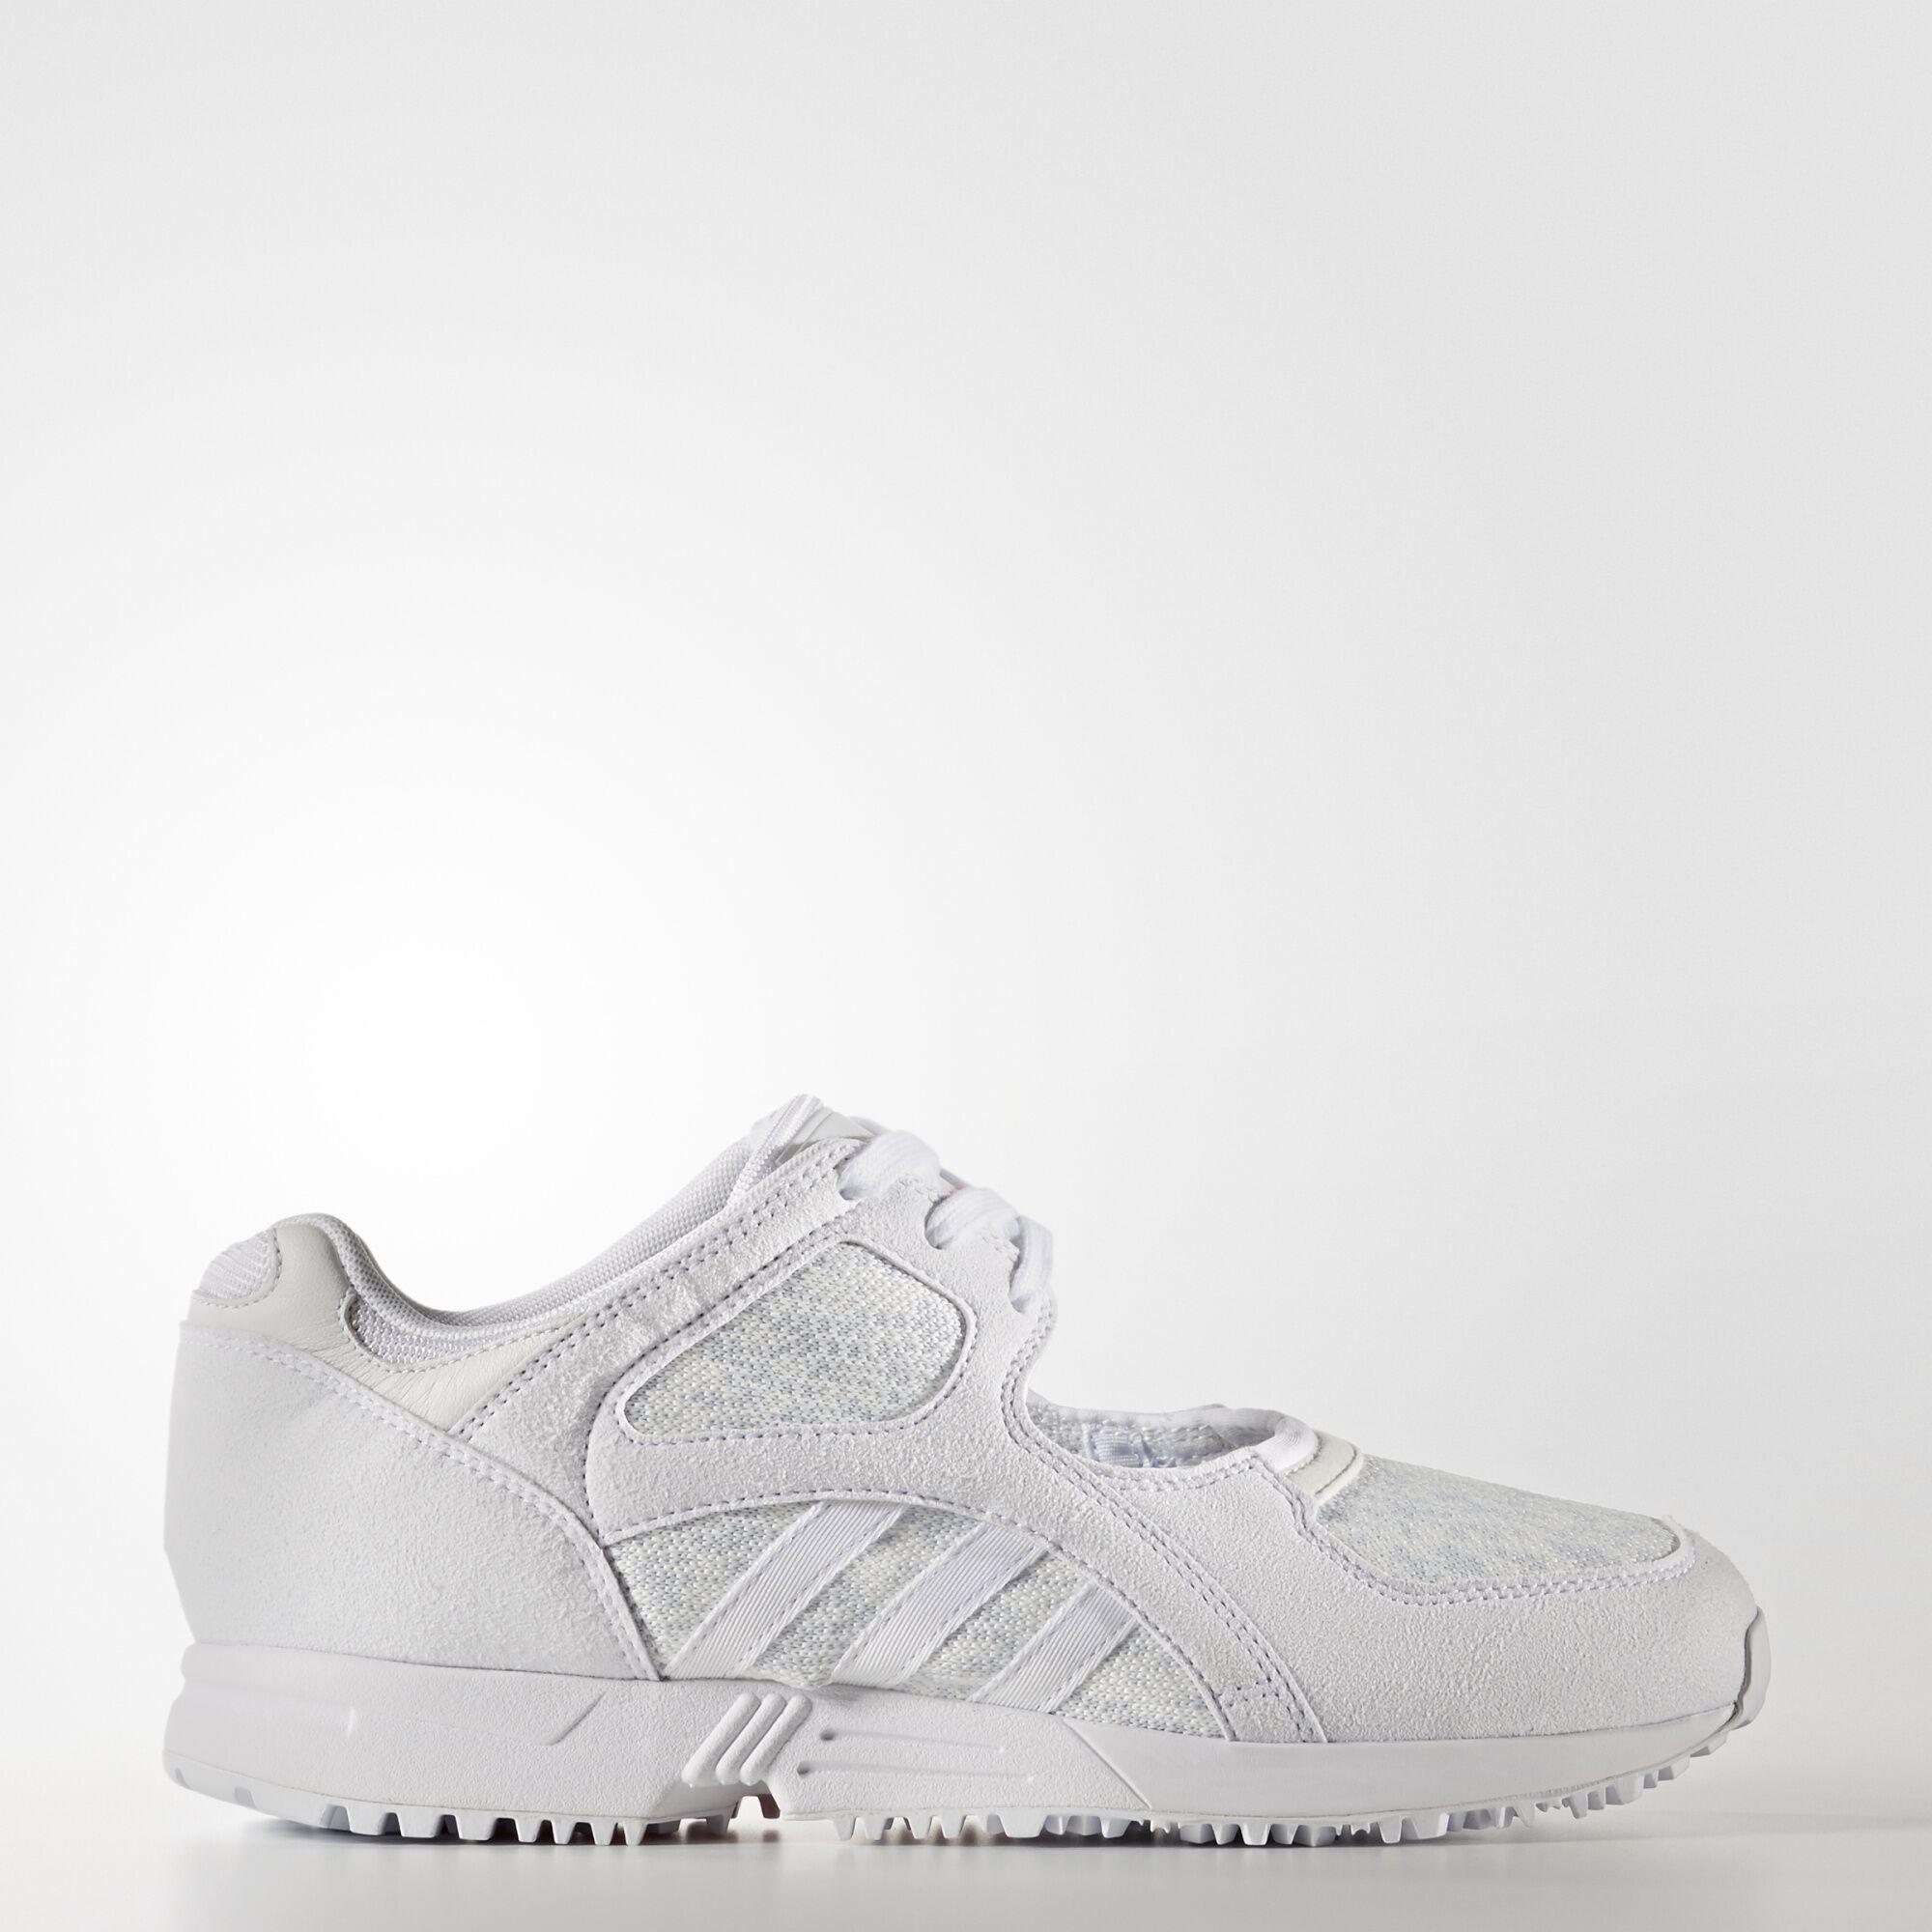 Adidas Eqt Womens White